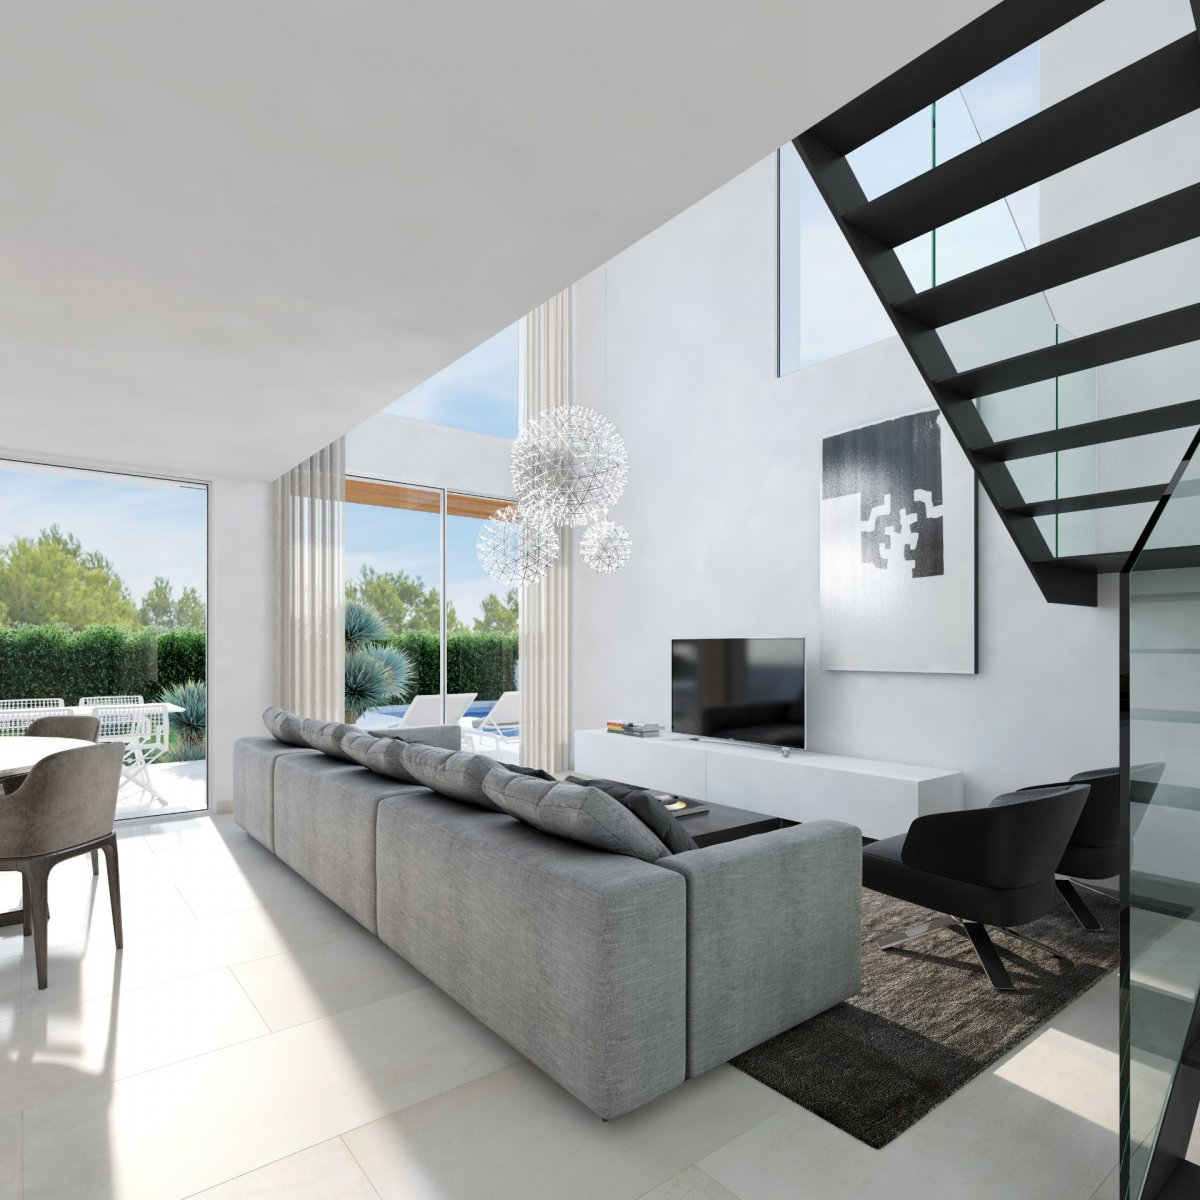 Villas with private pool in Sierra Cortina / Finestrat - Keysol Property S.L.